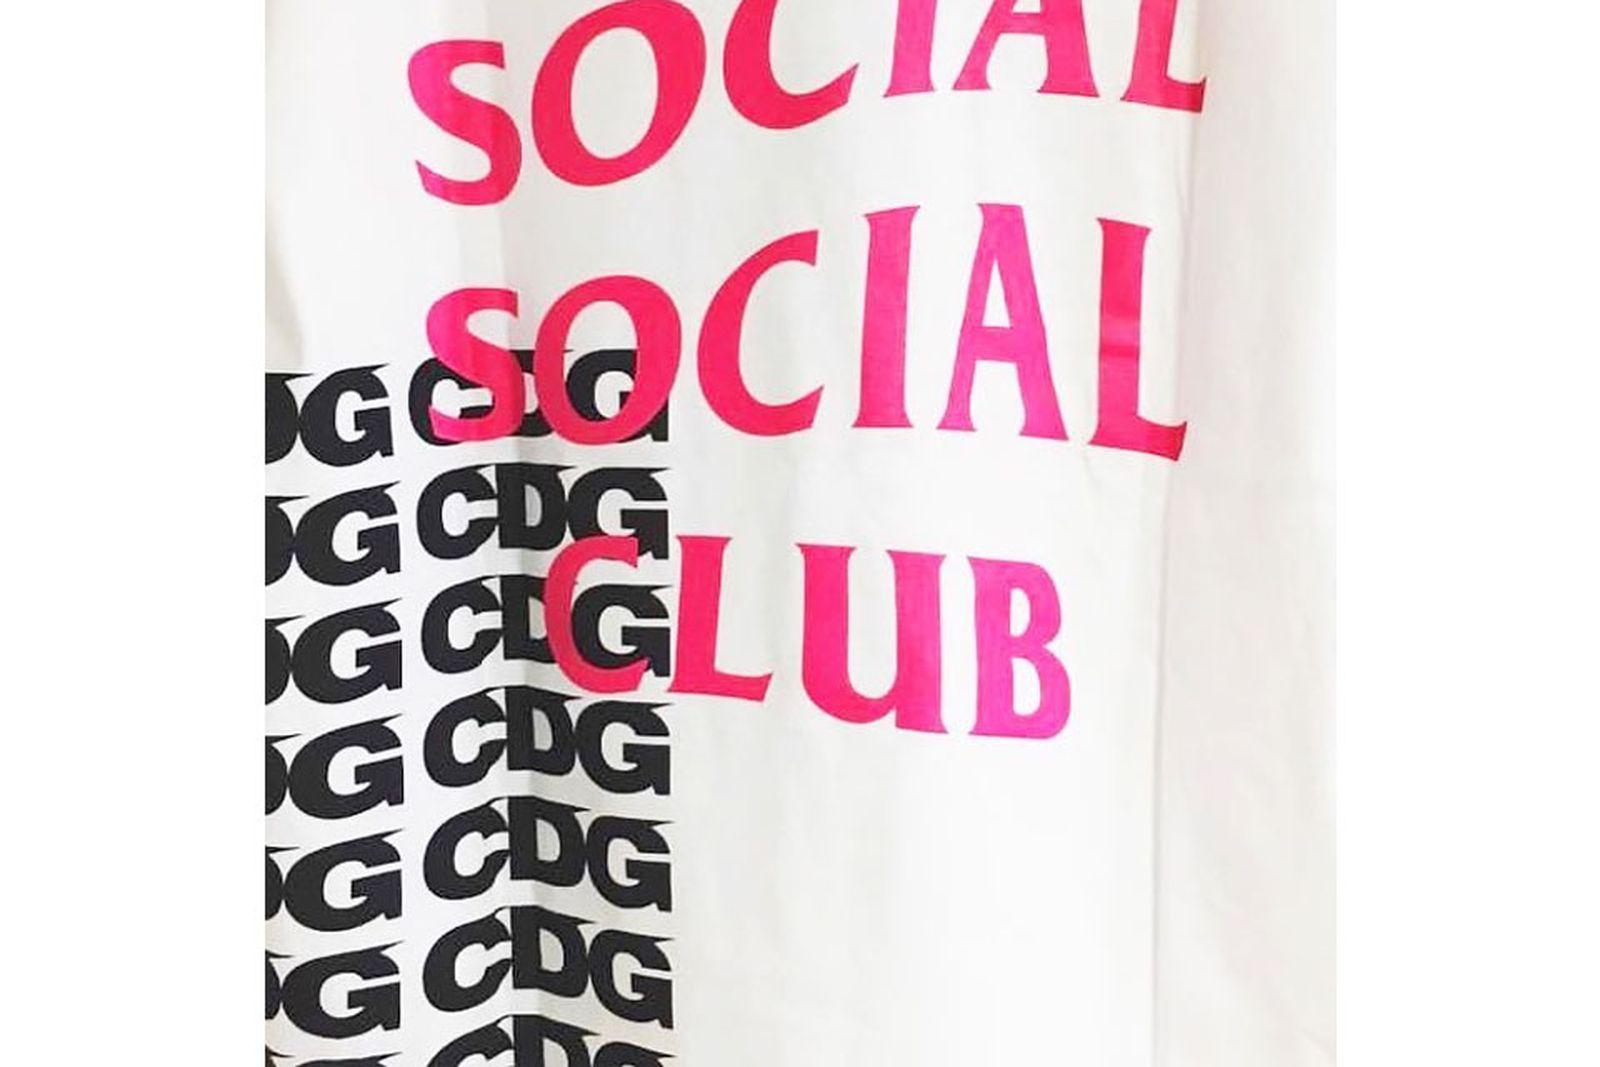 comme-des-garcons-anti-social-social-club-collab-1